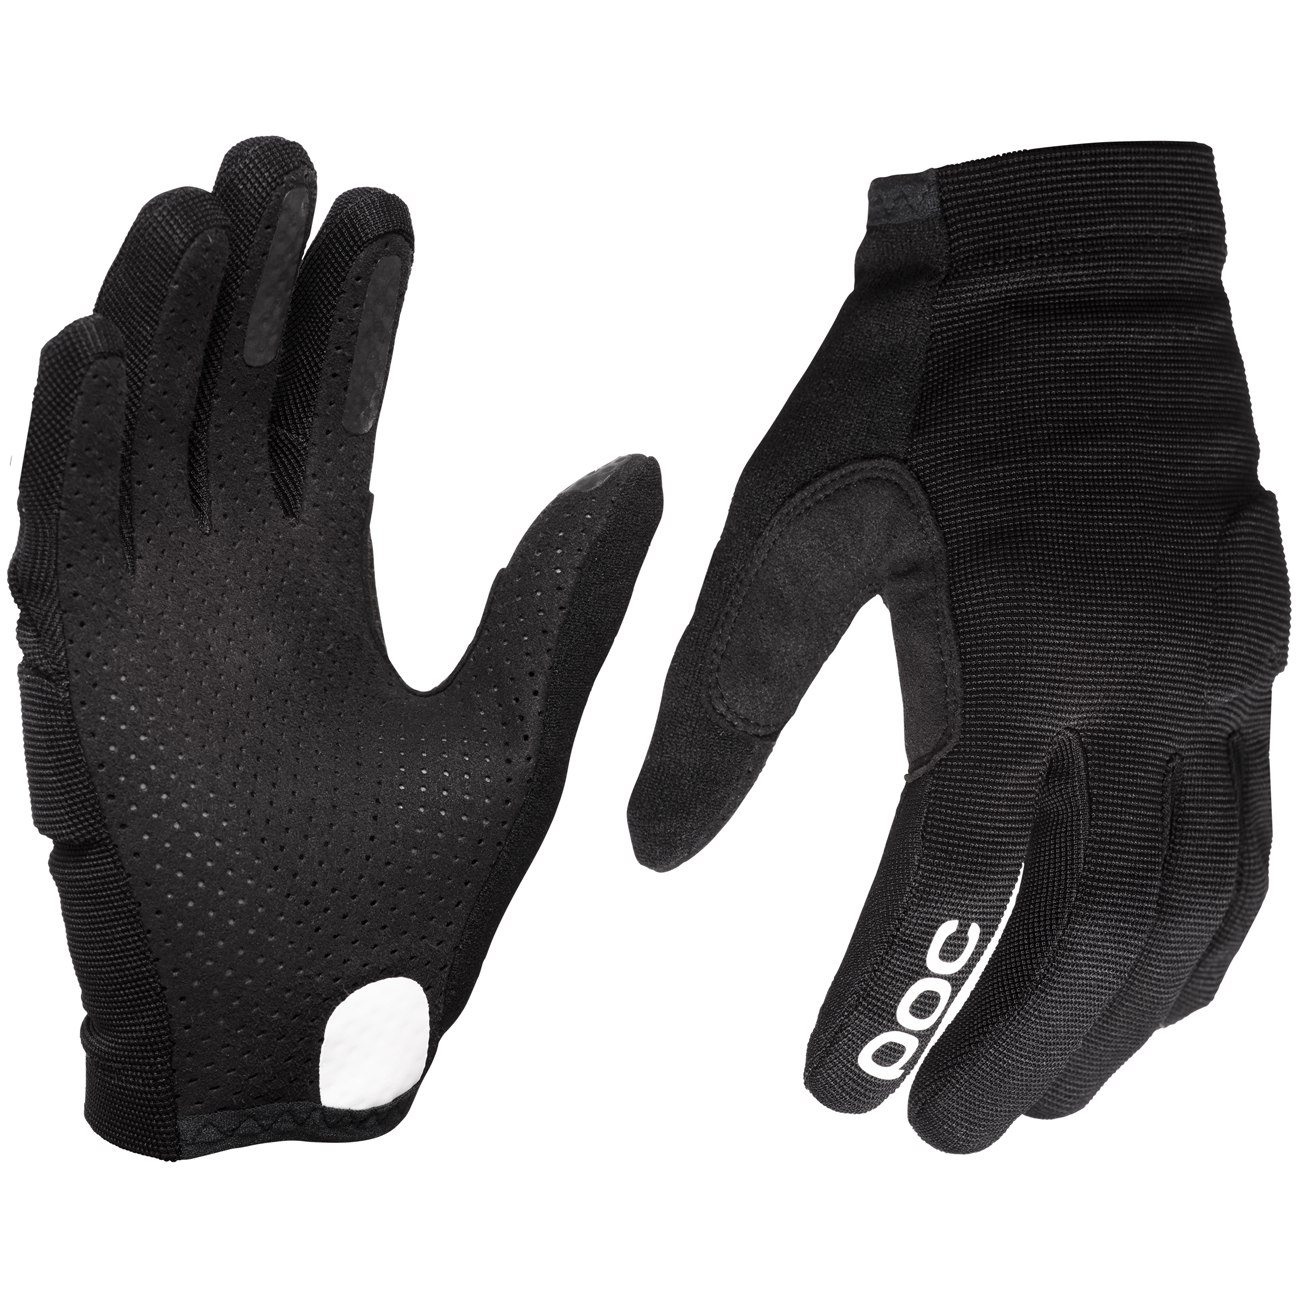 POC Essential DH Glove Handschuh - 1002 Uranium black